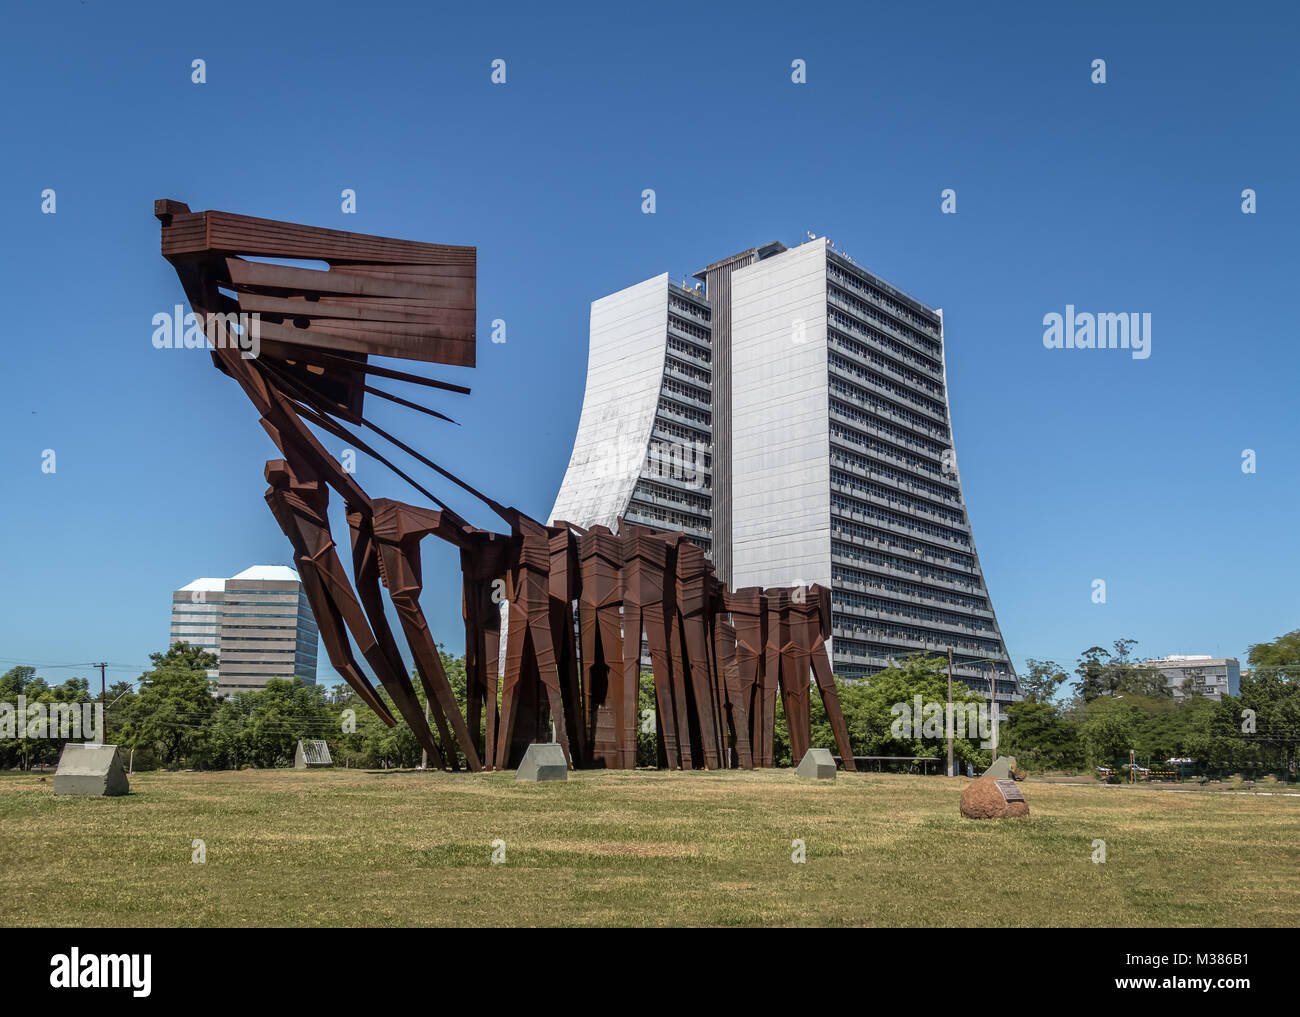 Azoreans (Acorianos) Monument and  Rio Grande do Sul Adminitrative Building  or Centro Administrativo Fernando Ferrari - Stock Image